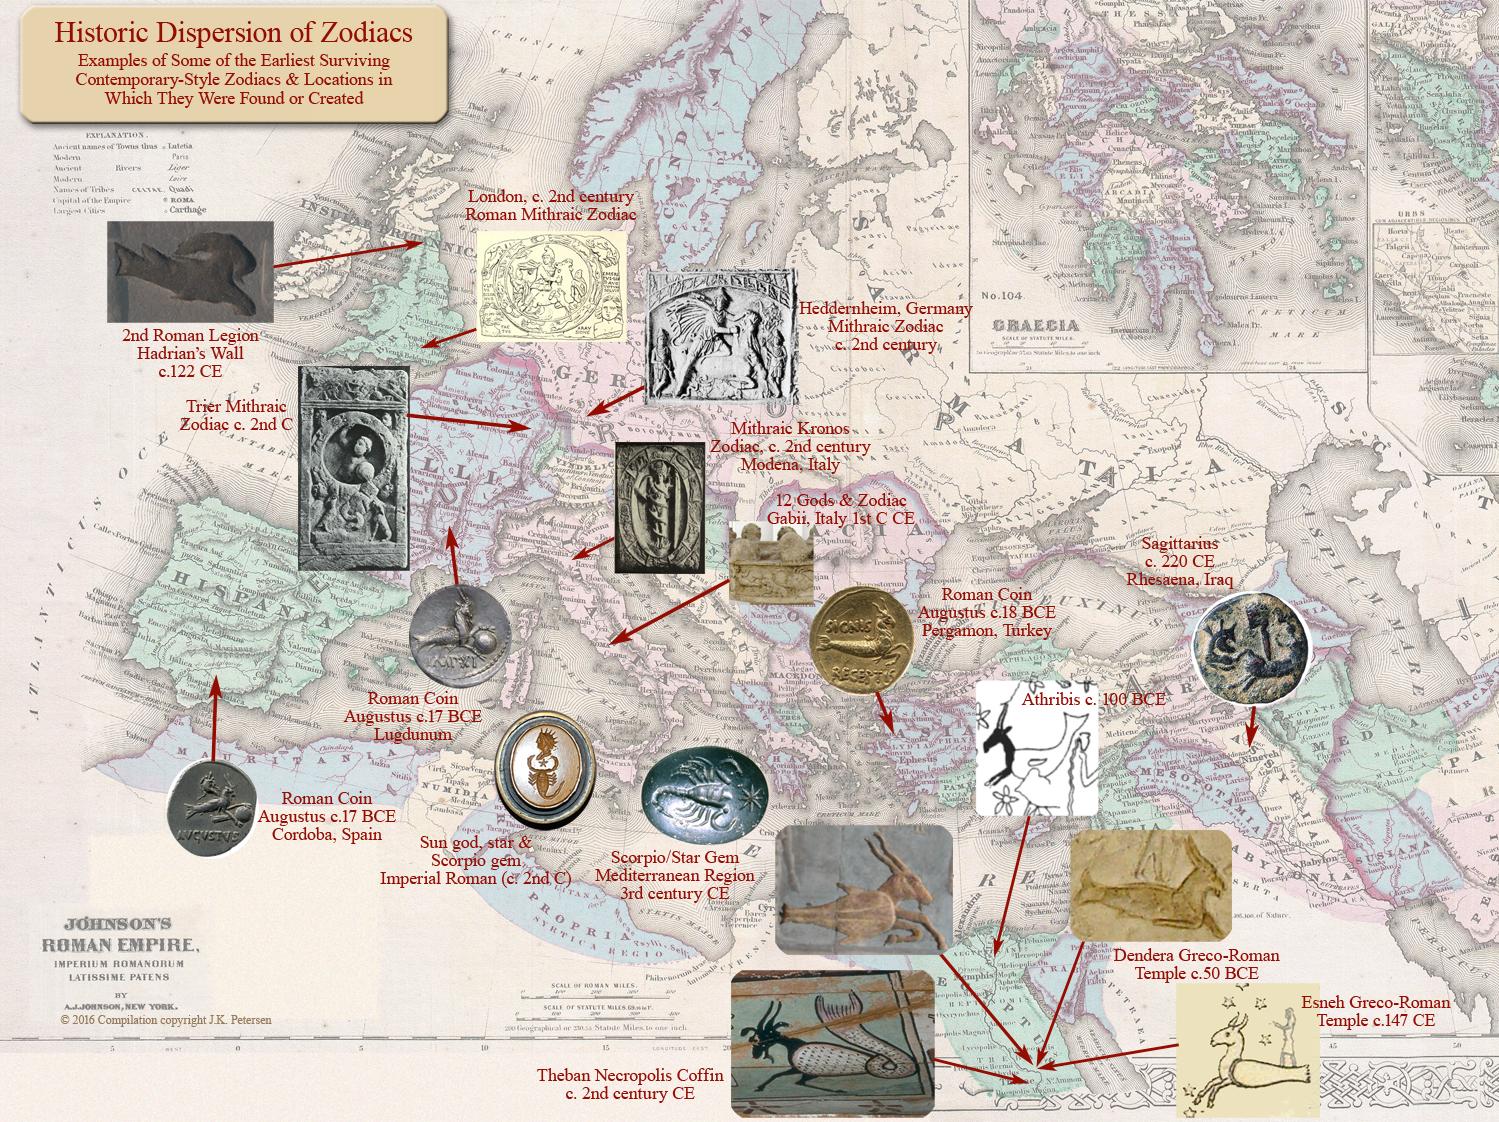 HistoricZodiacs